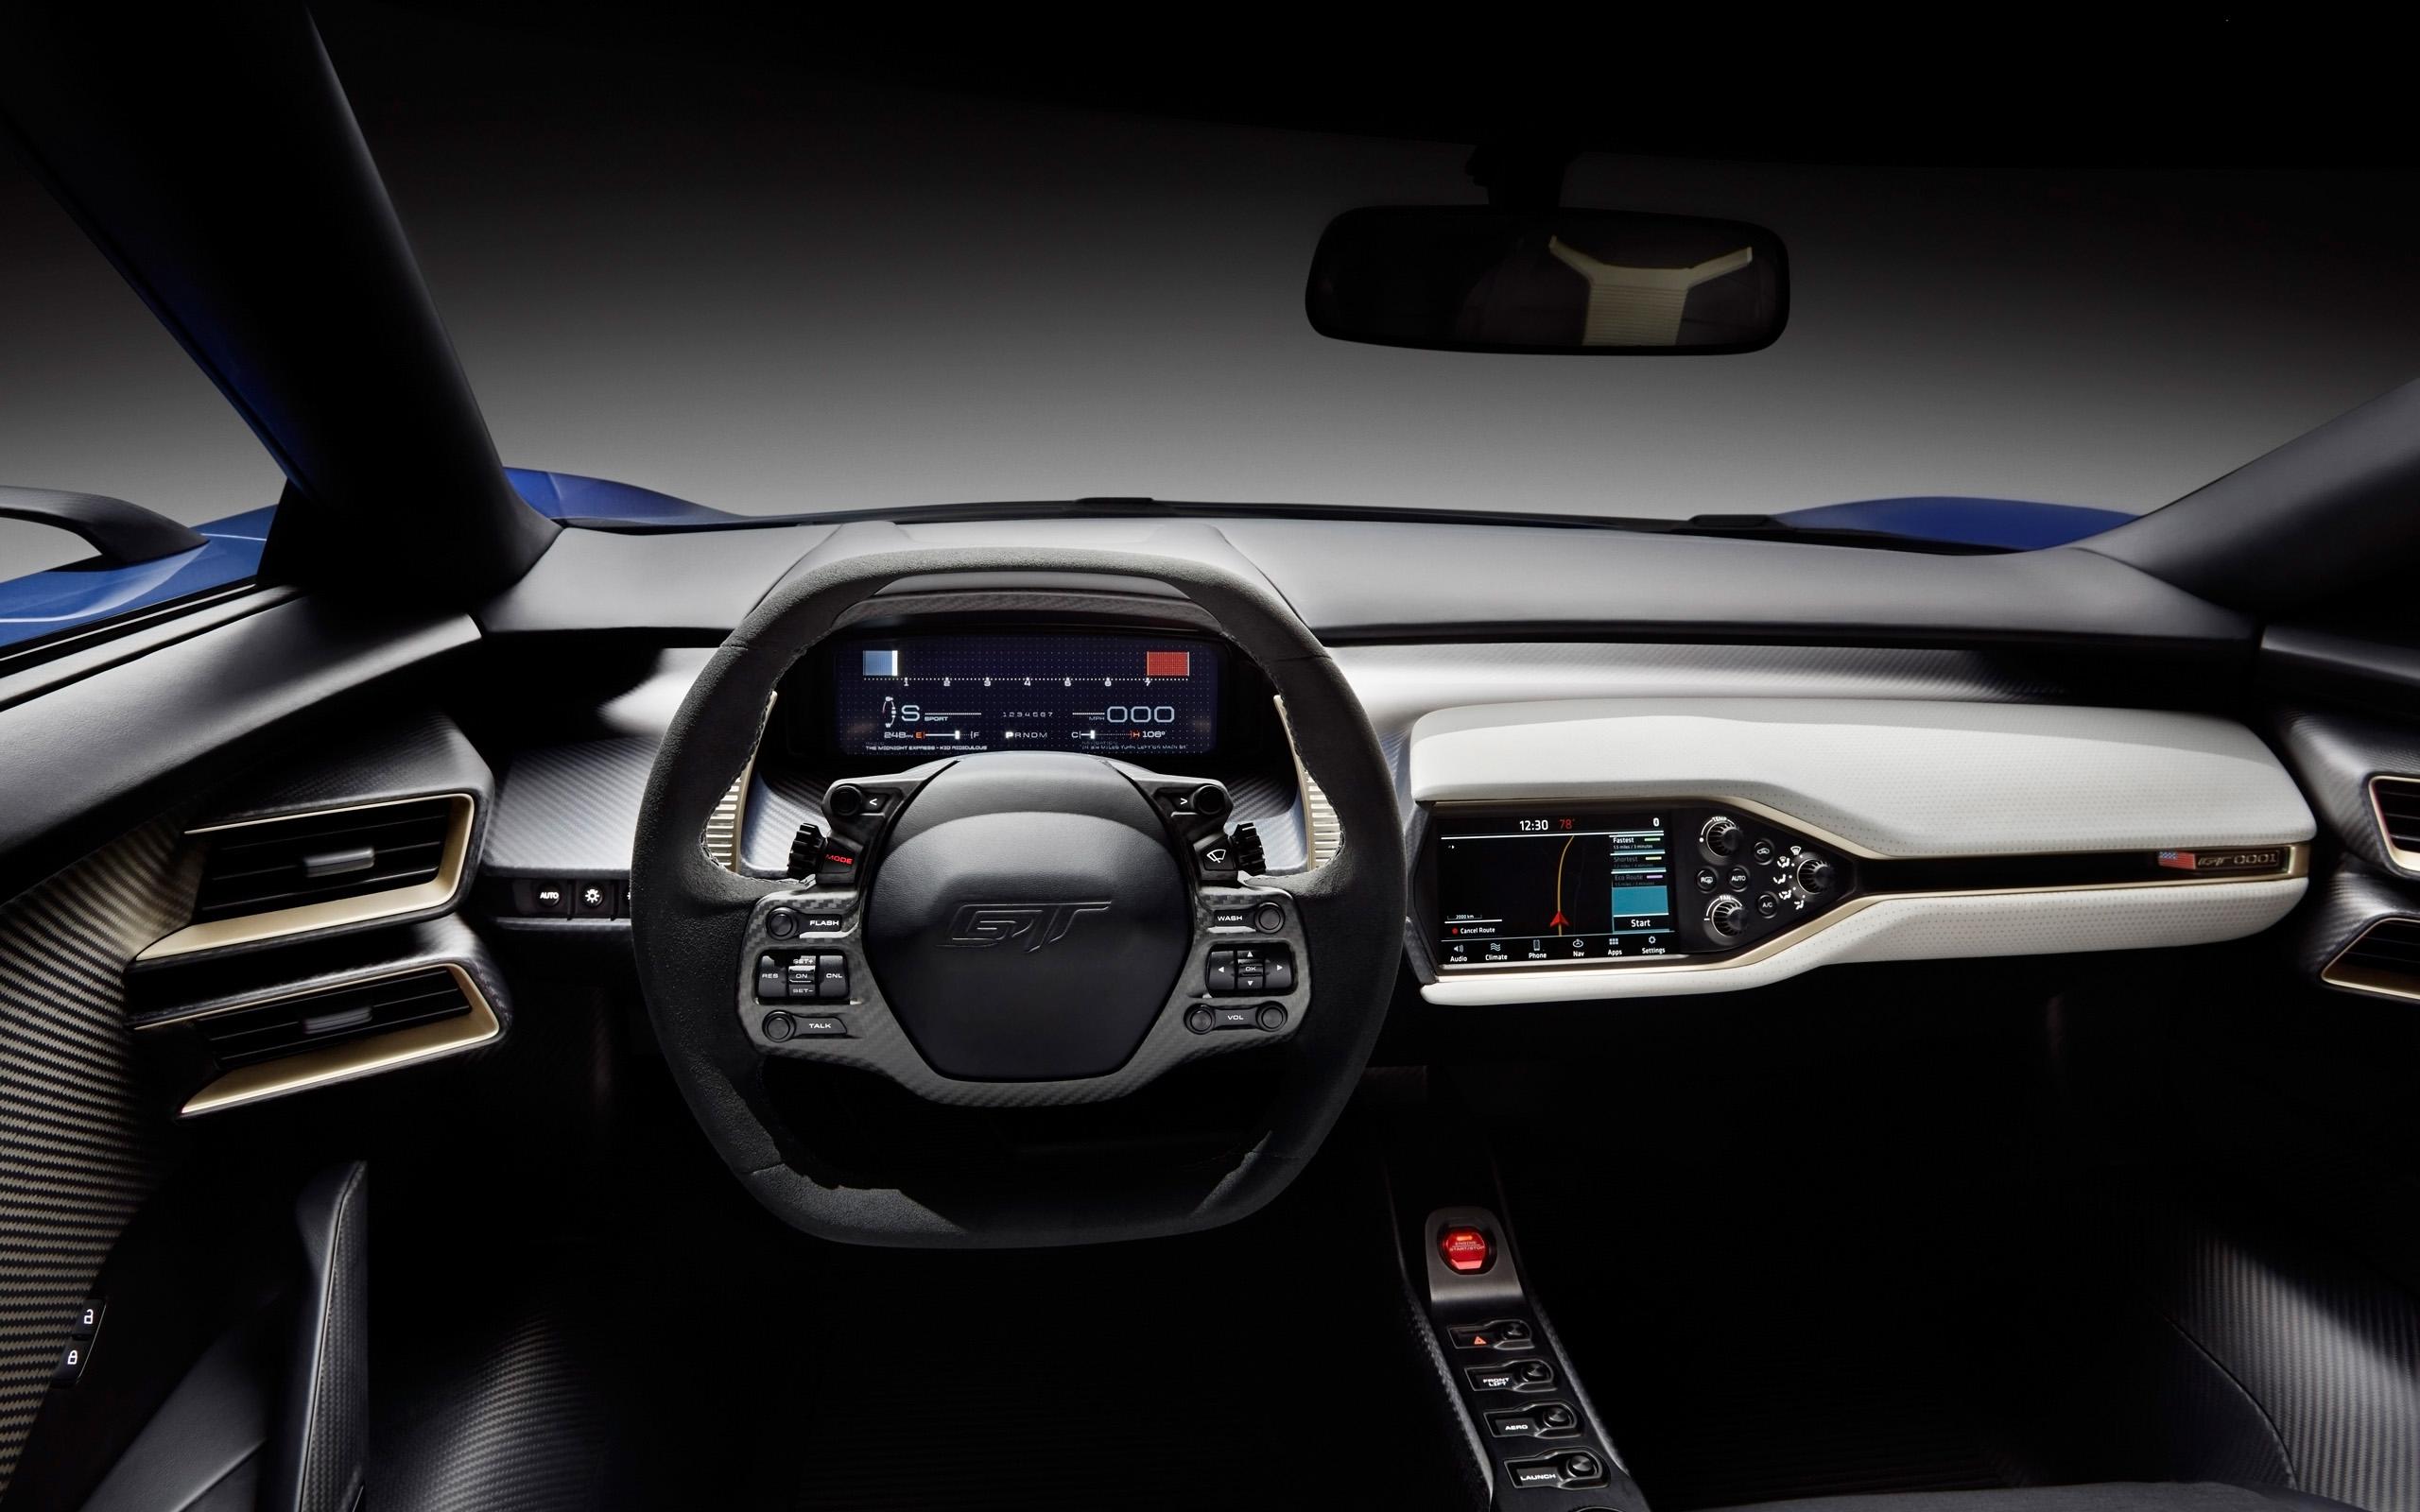 2016 Ford GT   Interior   2   2560x1600   Wallpaper 2560x1600